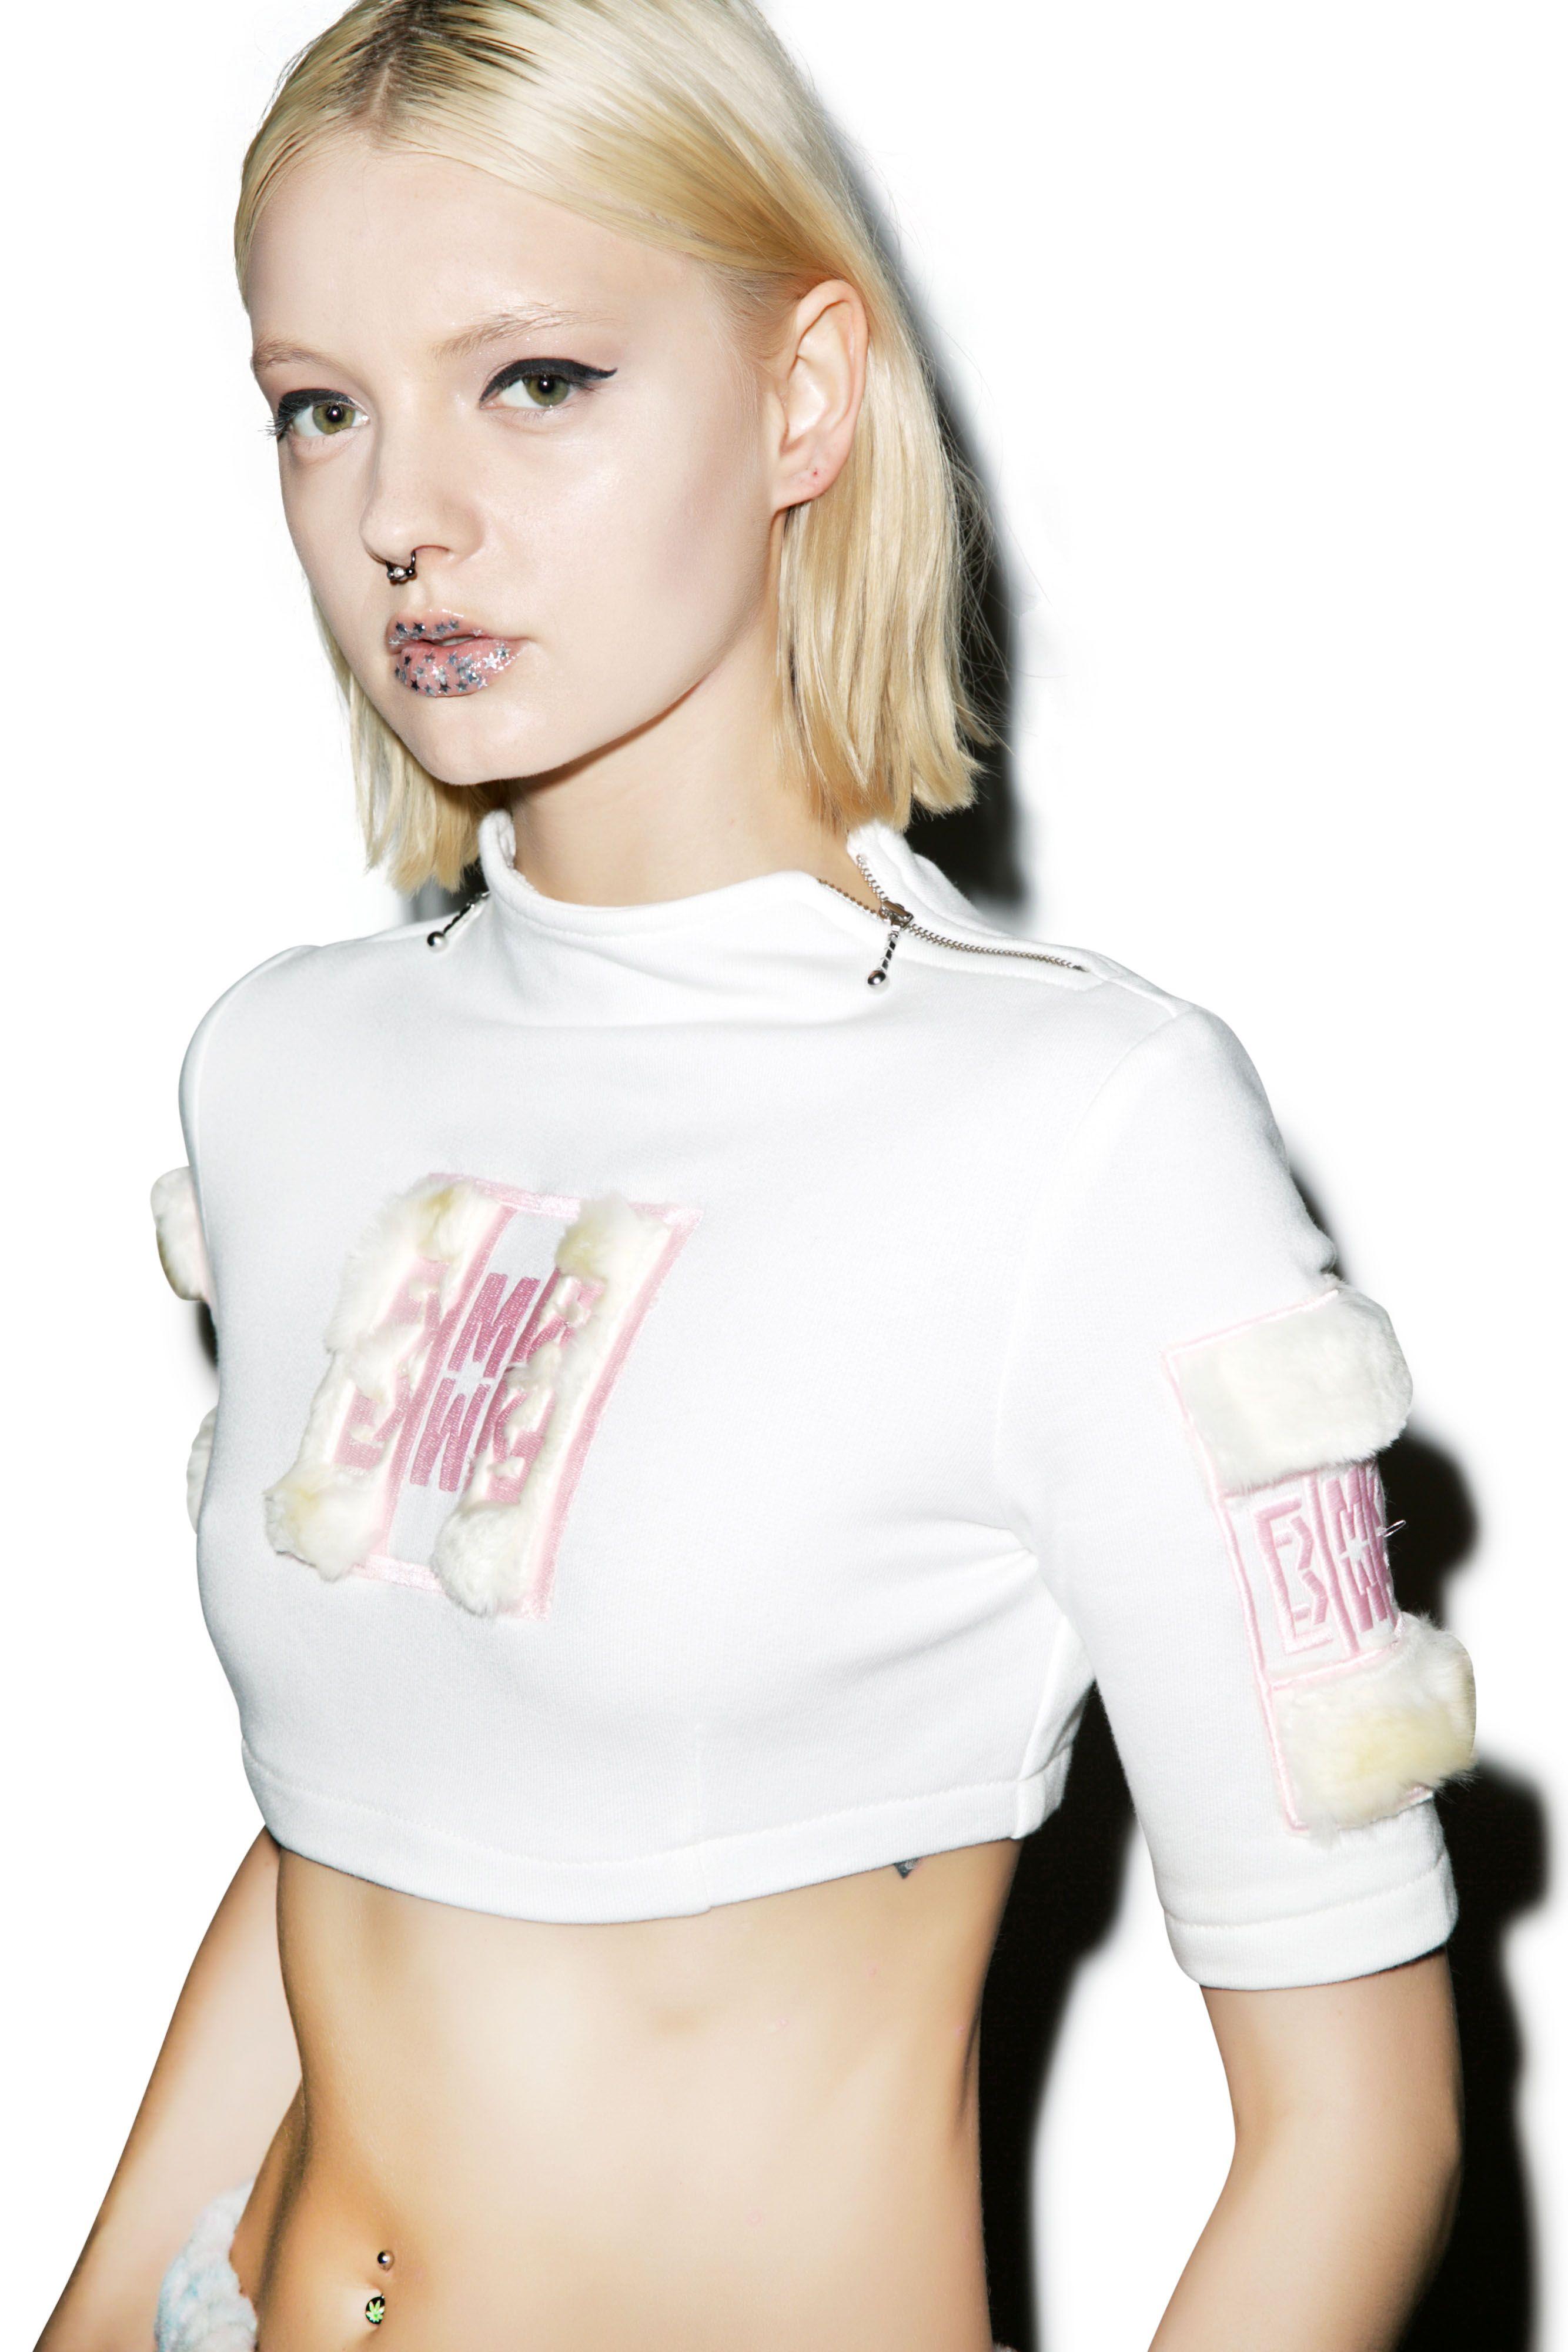 Maria K Fisherman Knit Street fashion – Hot Trend | Street Style Fashion Blog #mariakfisherman #knits #fashion